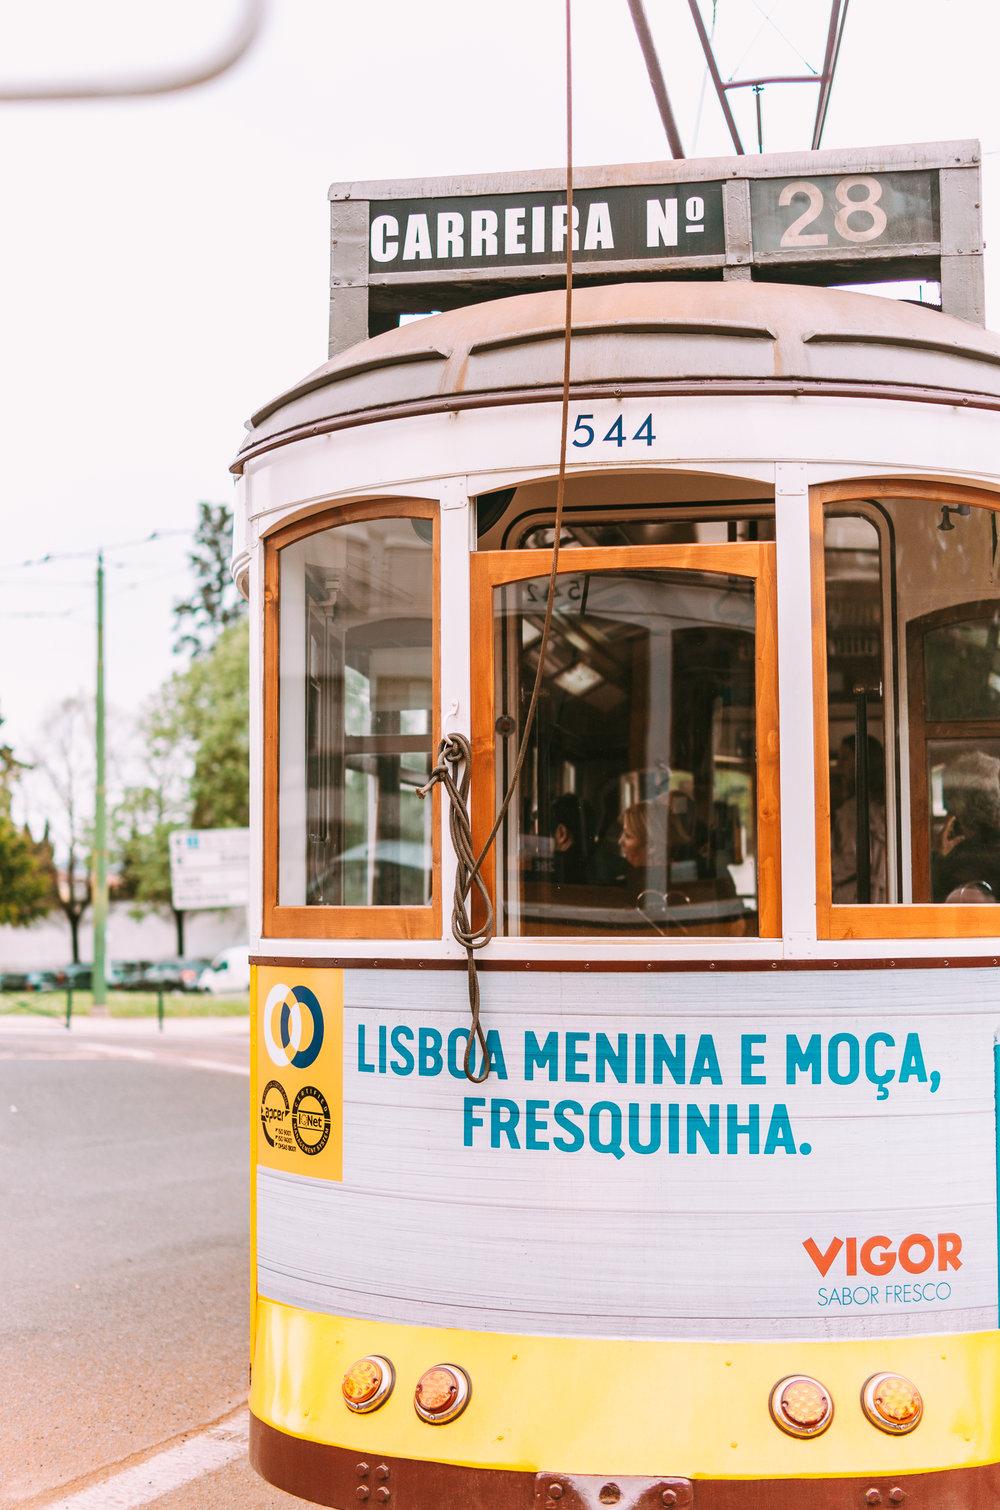 Portugal-1025205.jpg